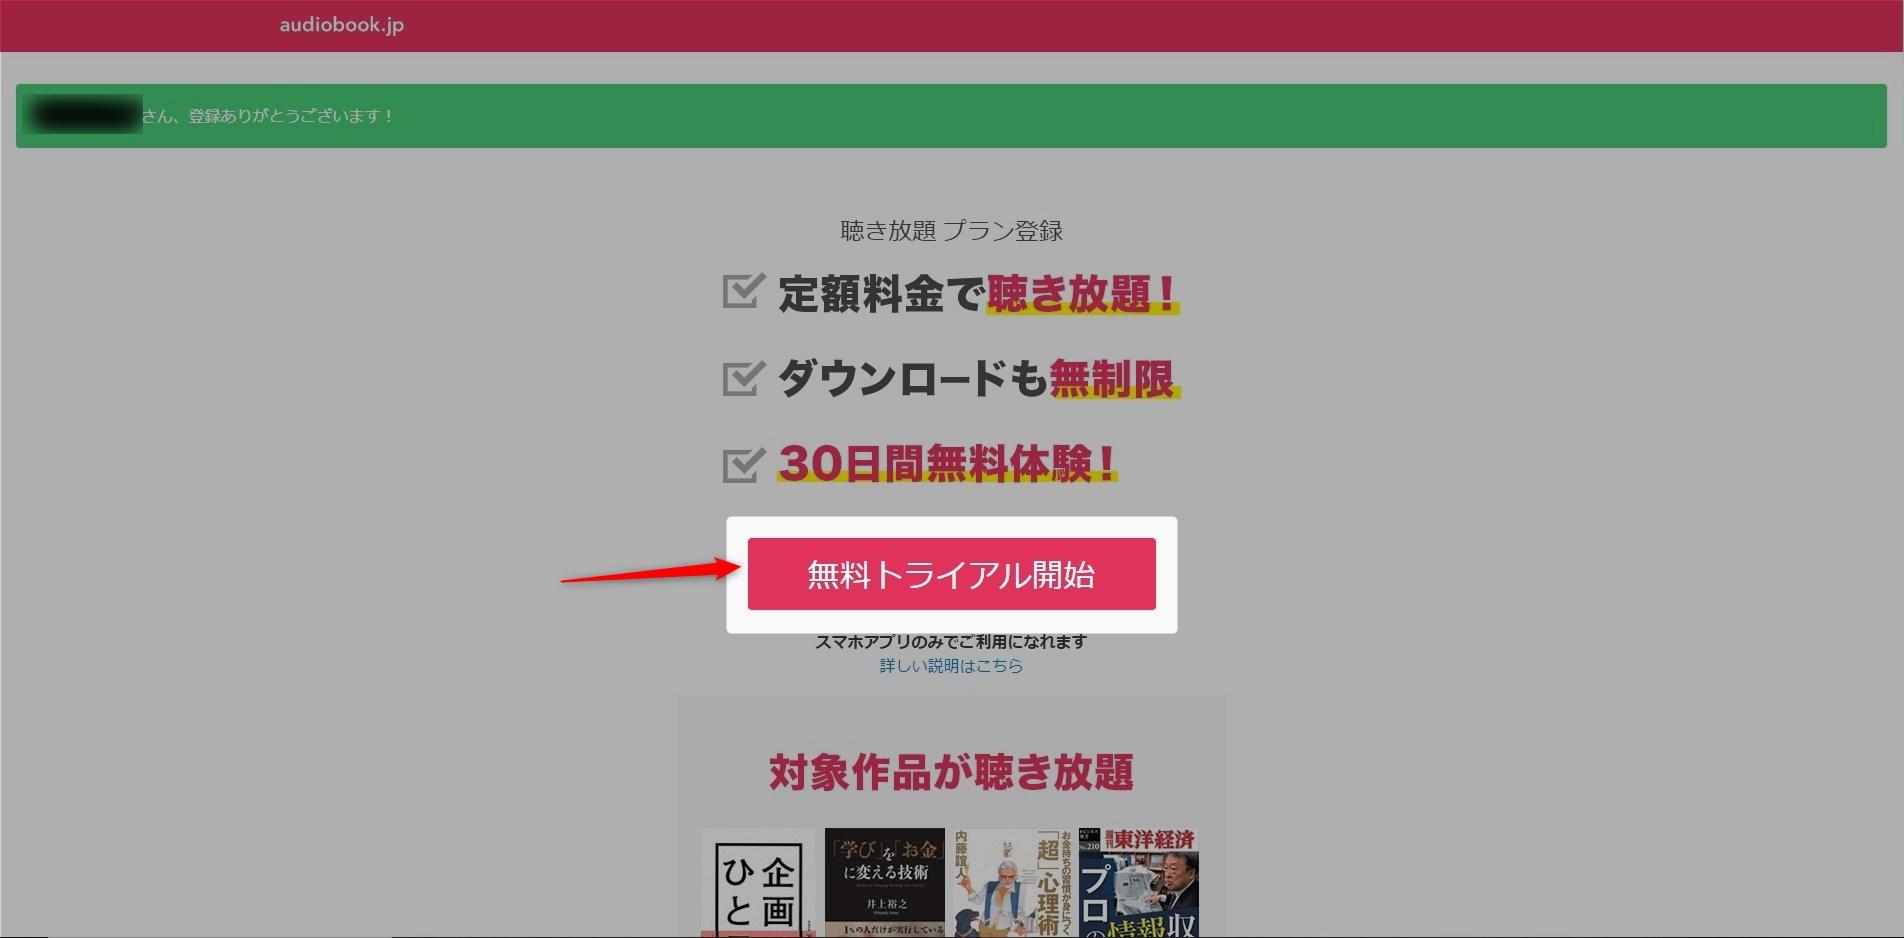 audiobook.jp無料トライアル開始